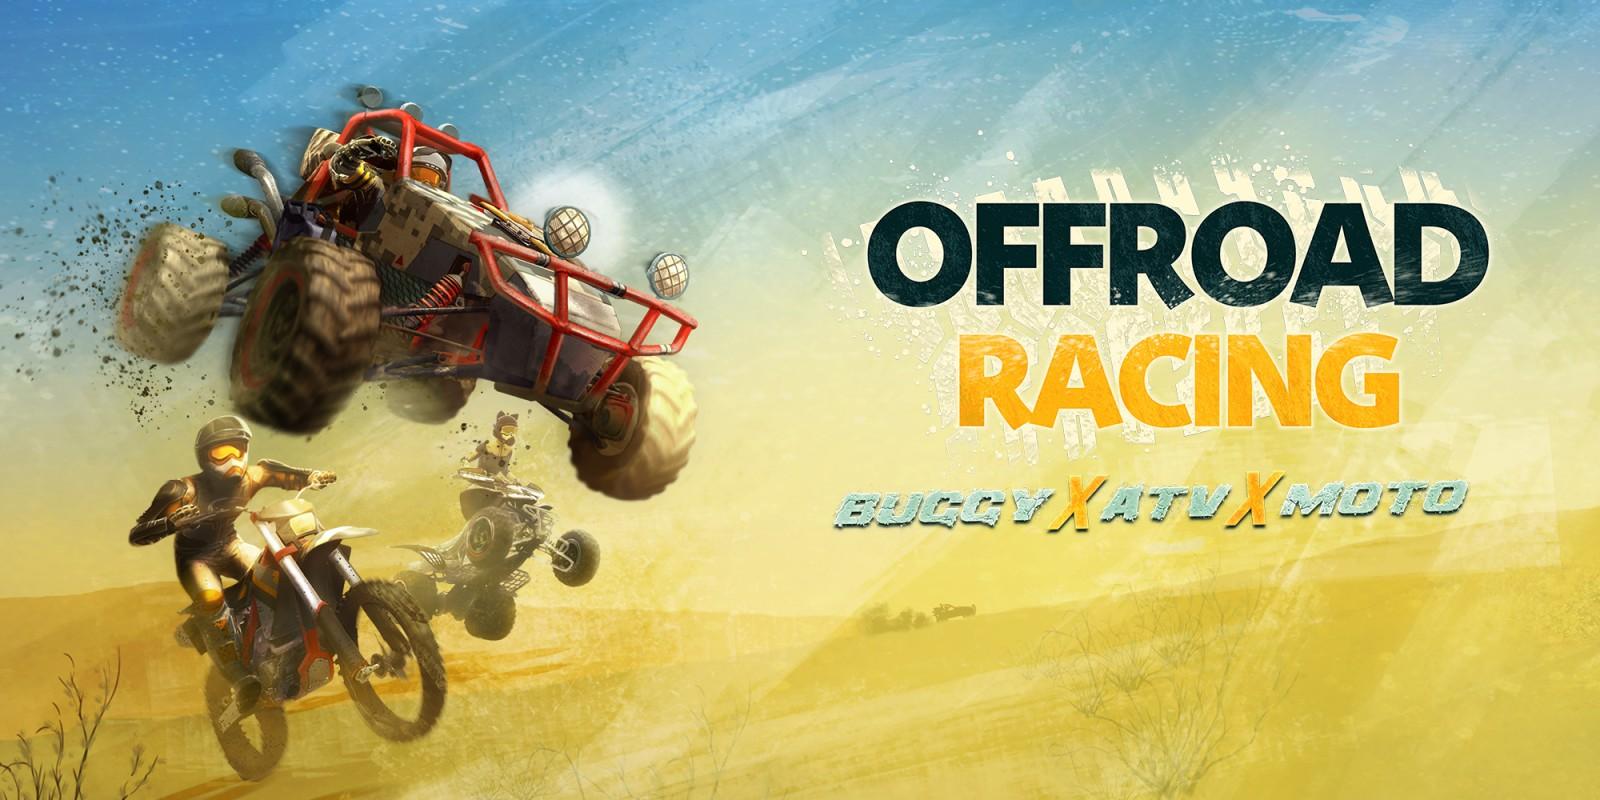 Offroad Racing Buggy X ATV X Moto Nintendo Switch